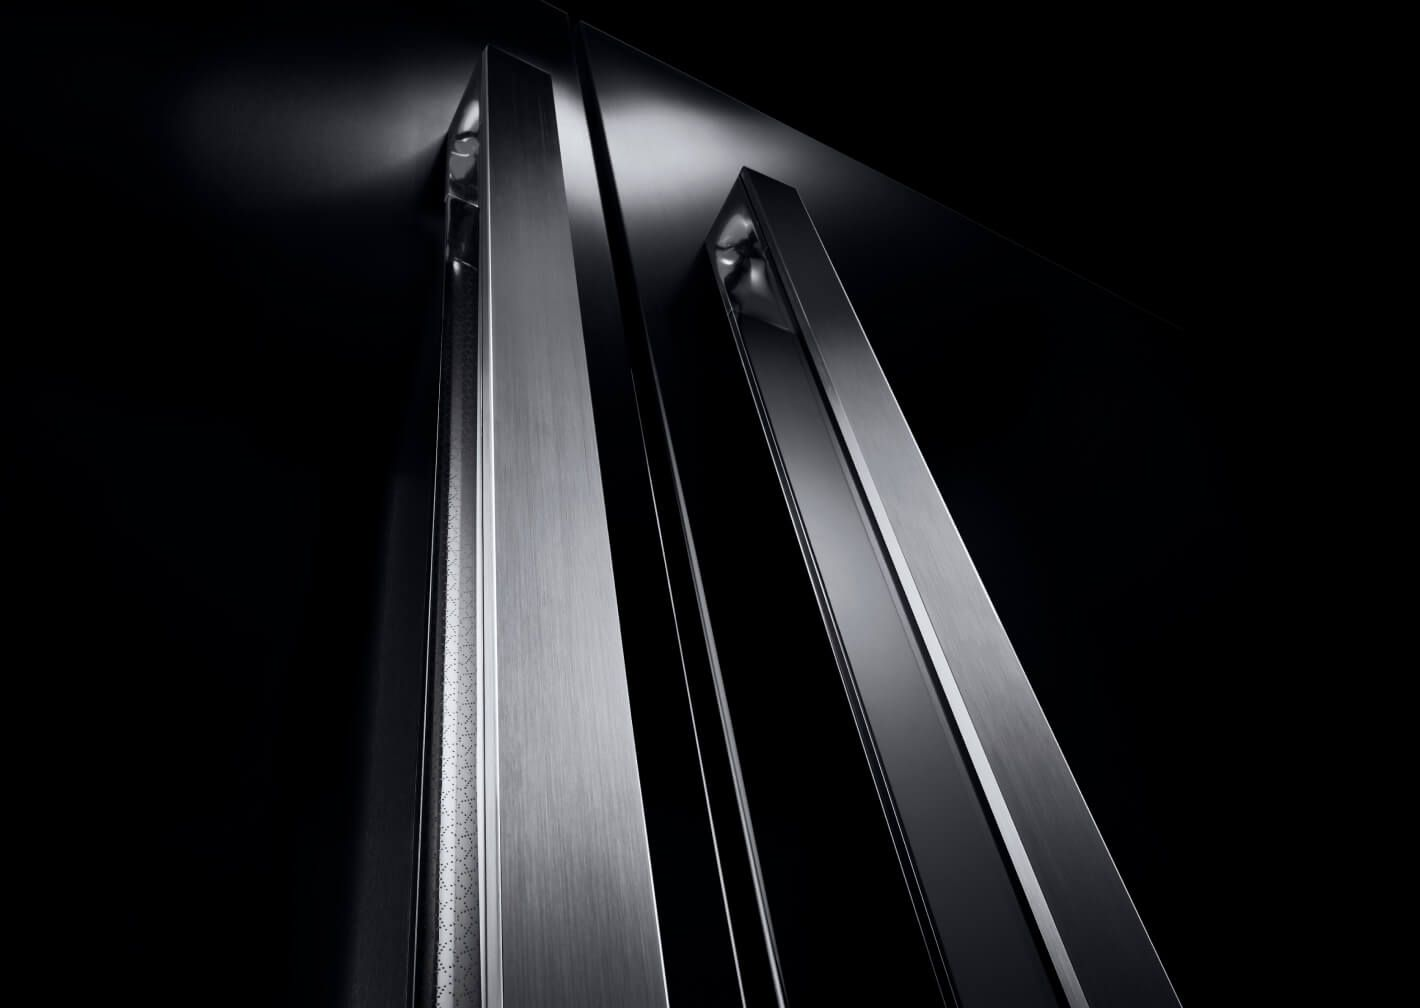 A close up of the handles on a NOIR™ Design column pair.